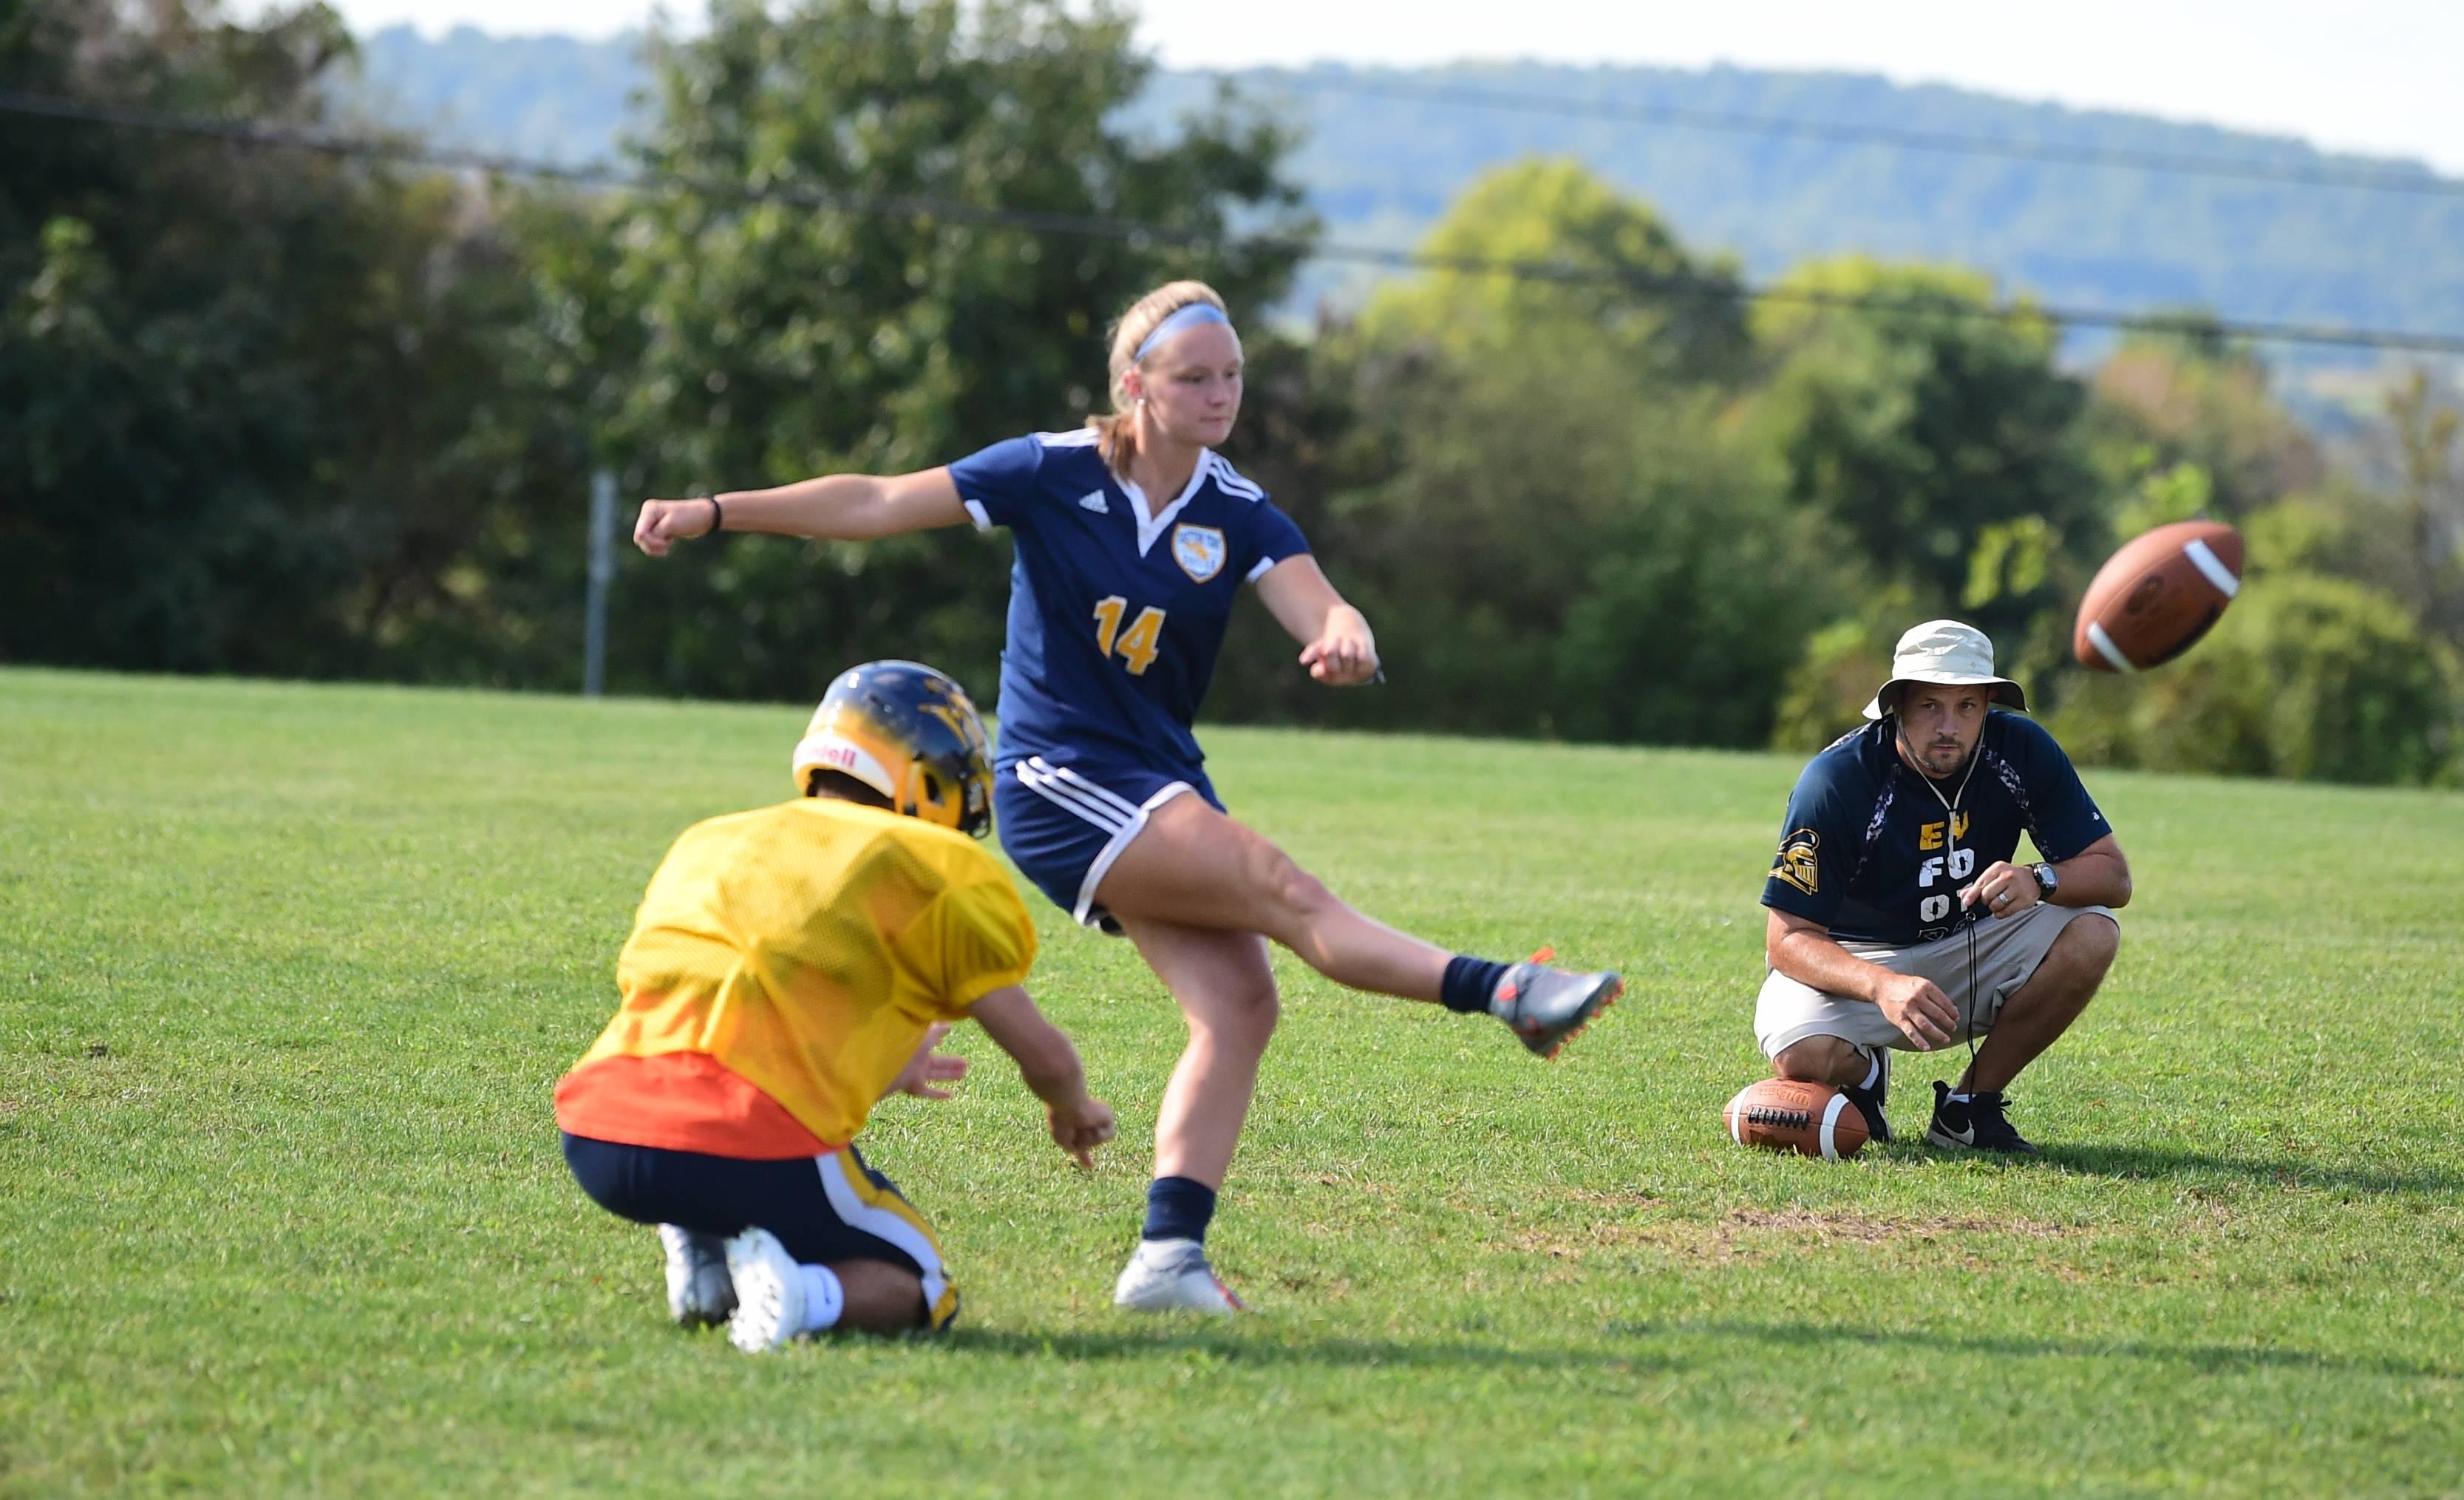 Yaiaa Football Eastern York S Girl Kicker A Full Fledged Team Member